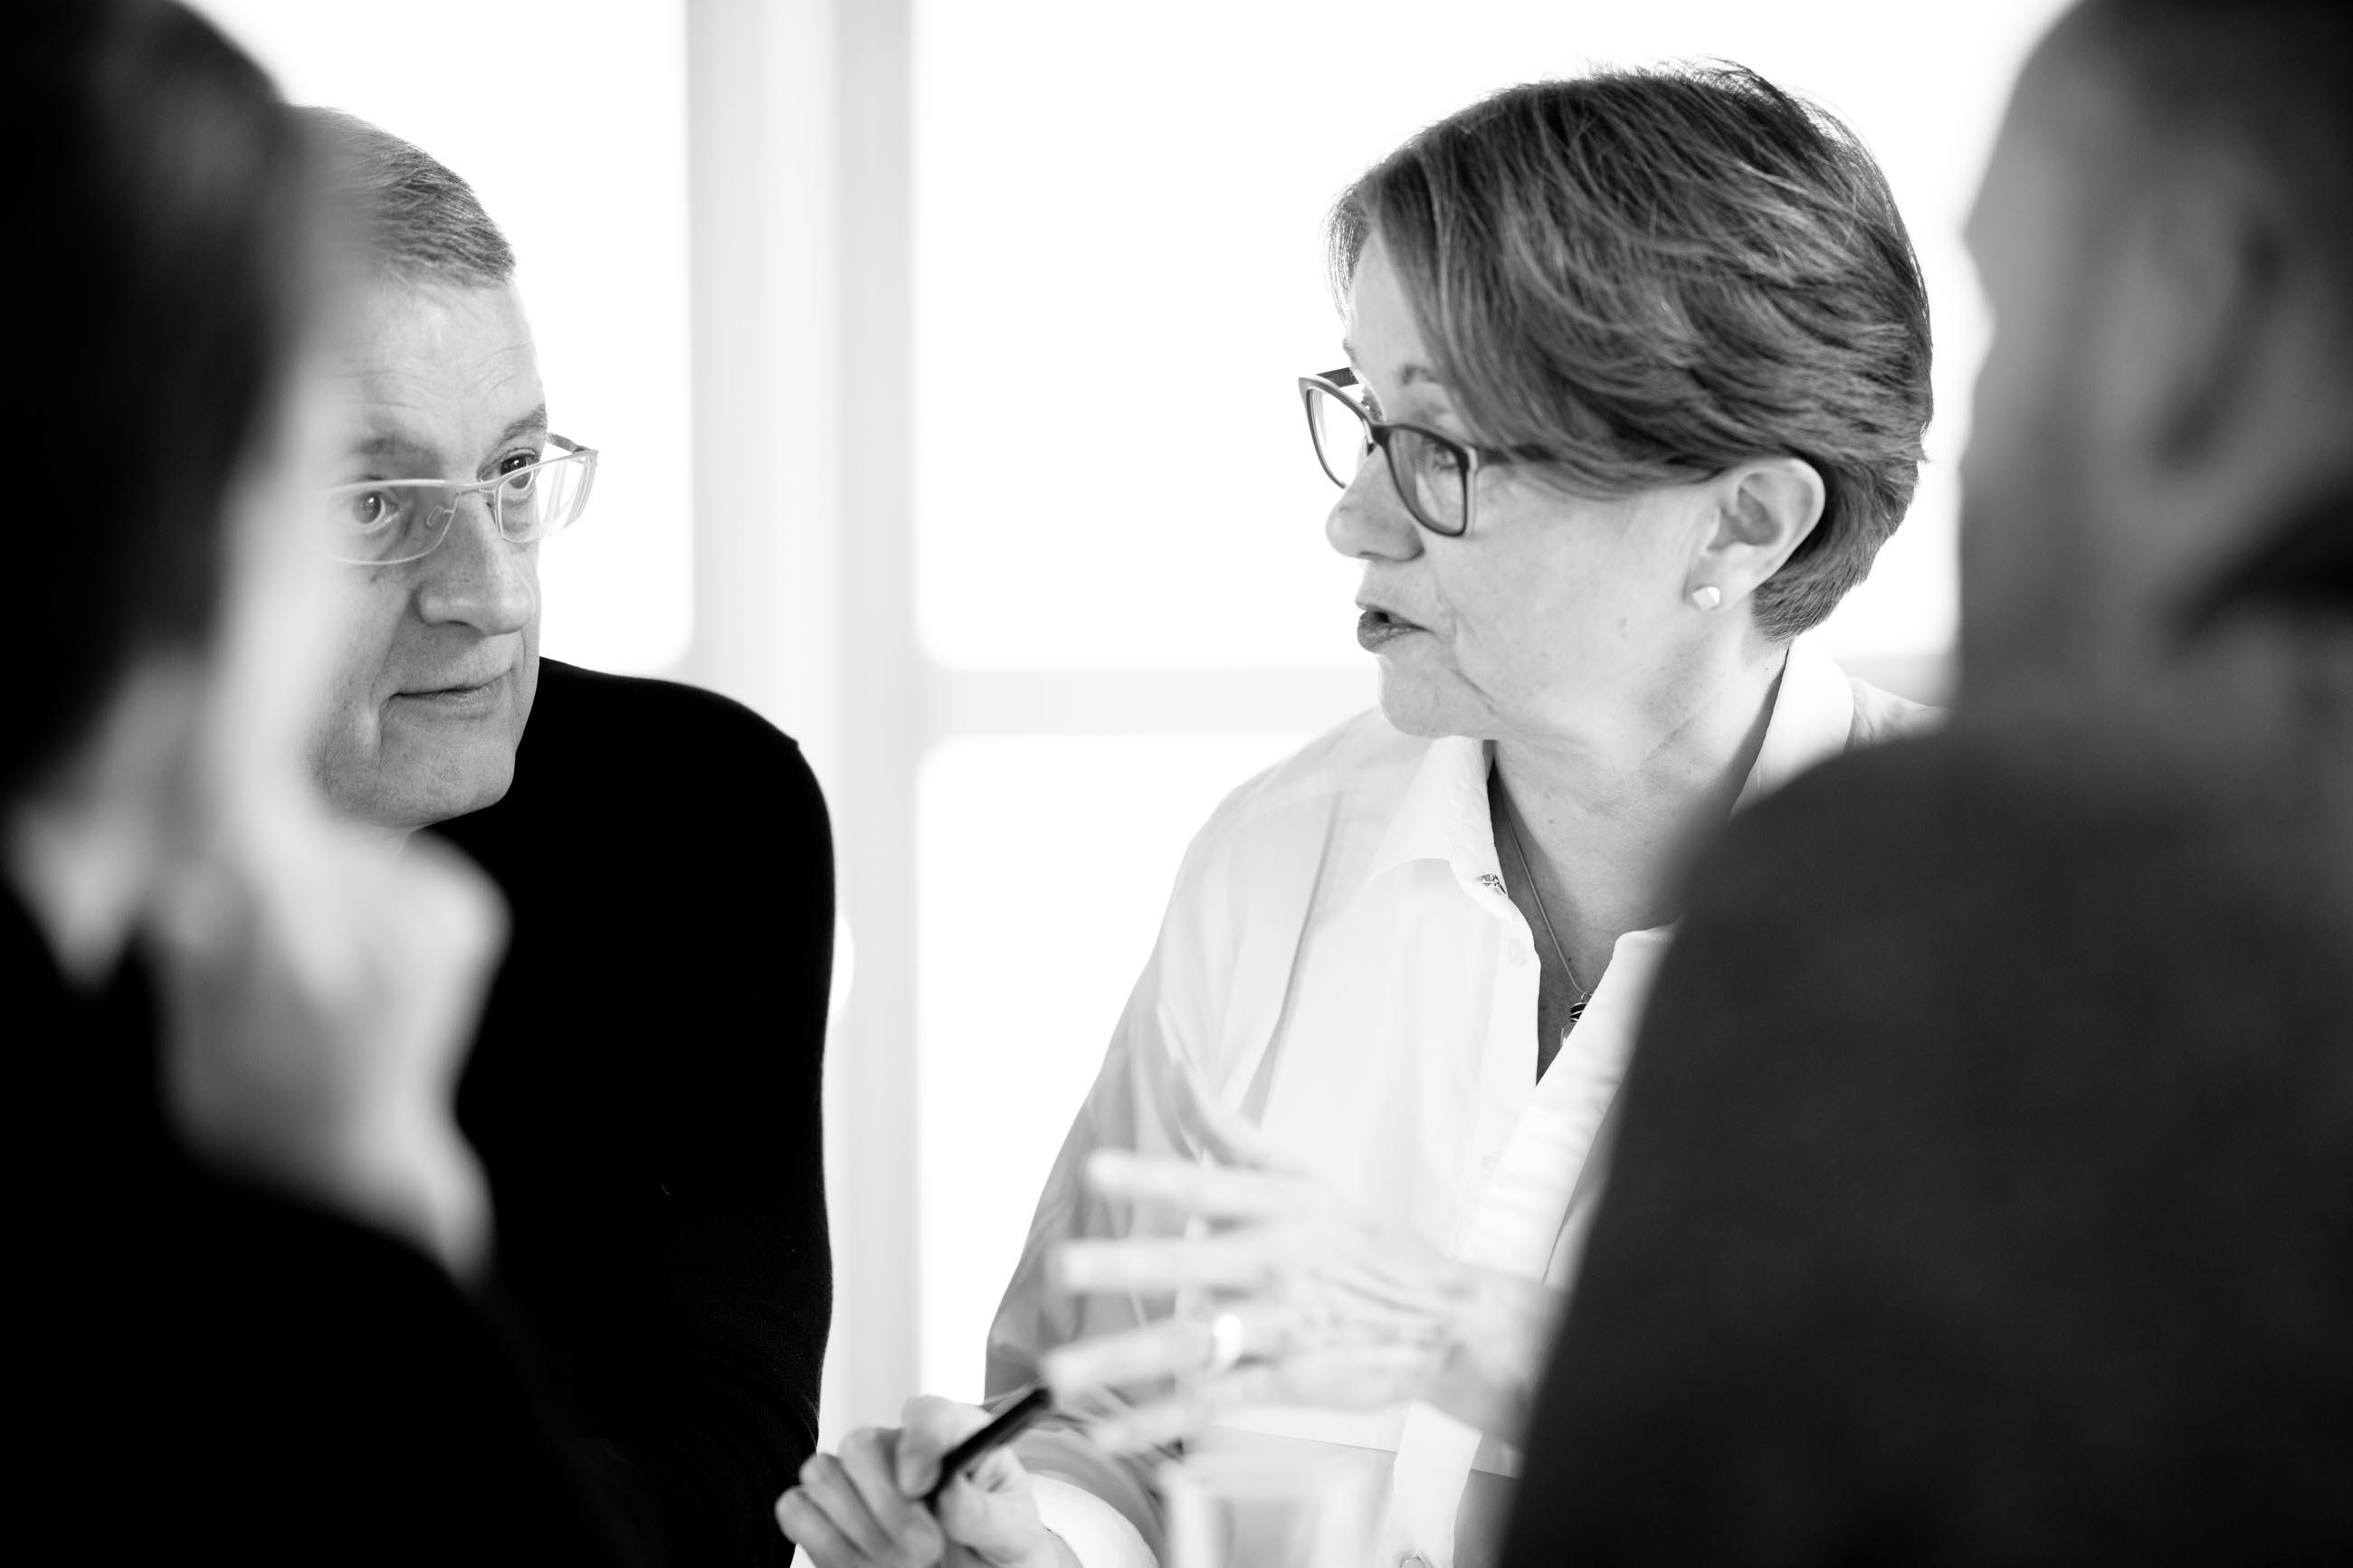 Andreas Herzau, Renate Ruhne, Coaching, Mediation, Kommunikation